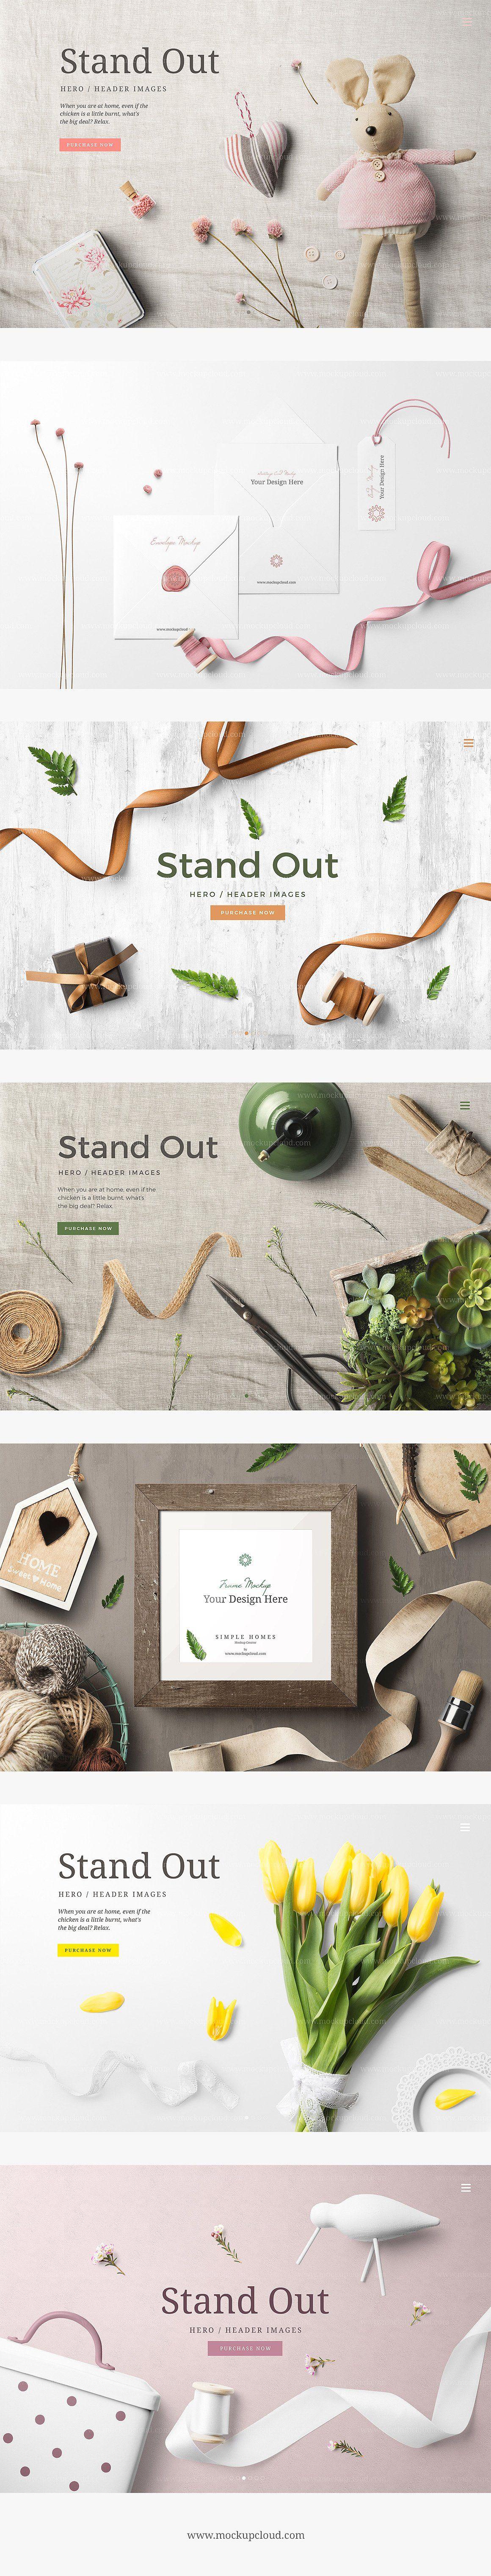 Simple Homes Mockup Creator Product Mockups template photo